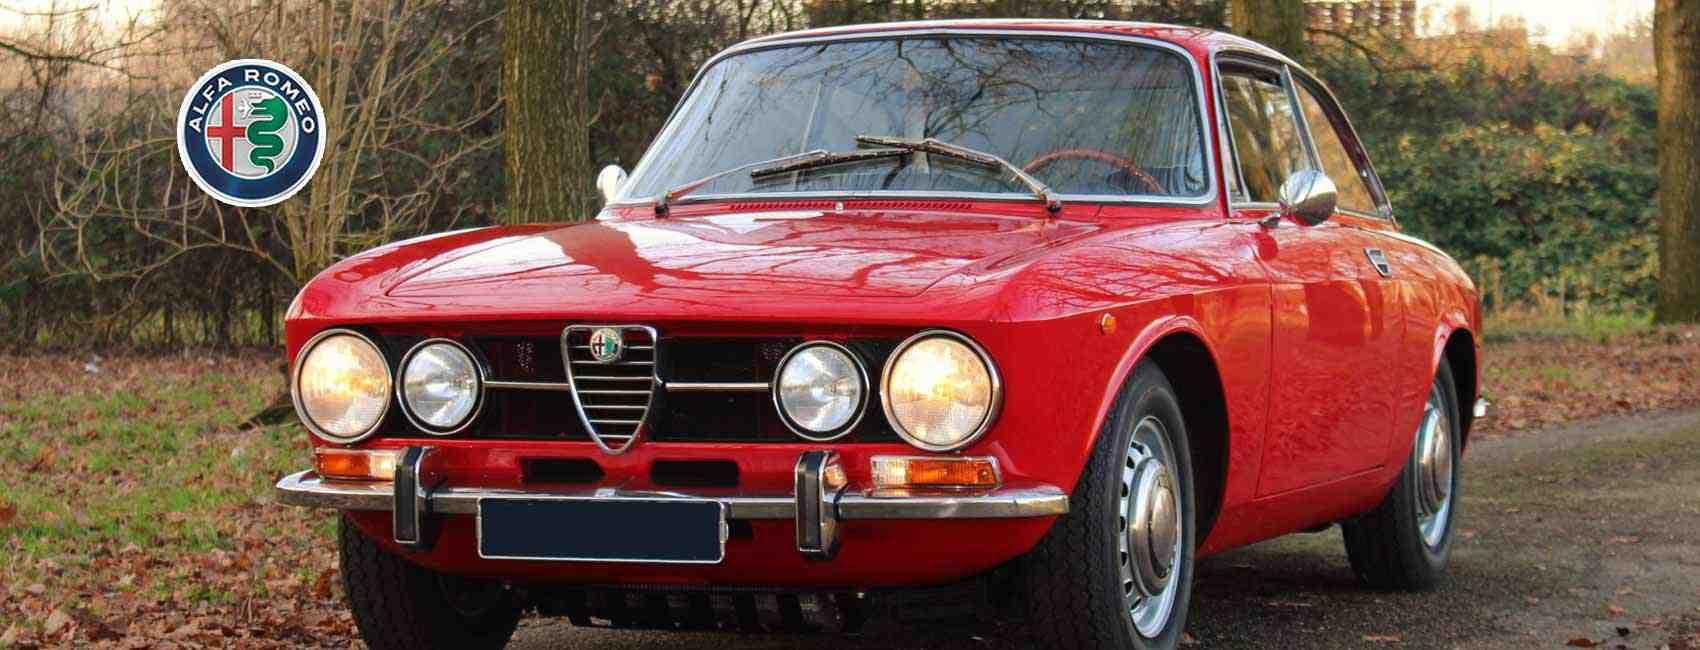 Used Alfa Romeo Parts - Buy Used Alfa Romeo OEM Parts Online